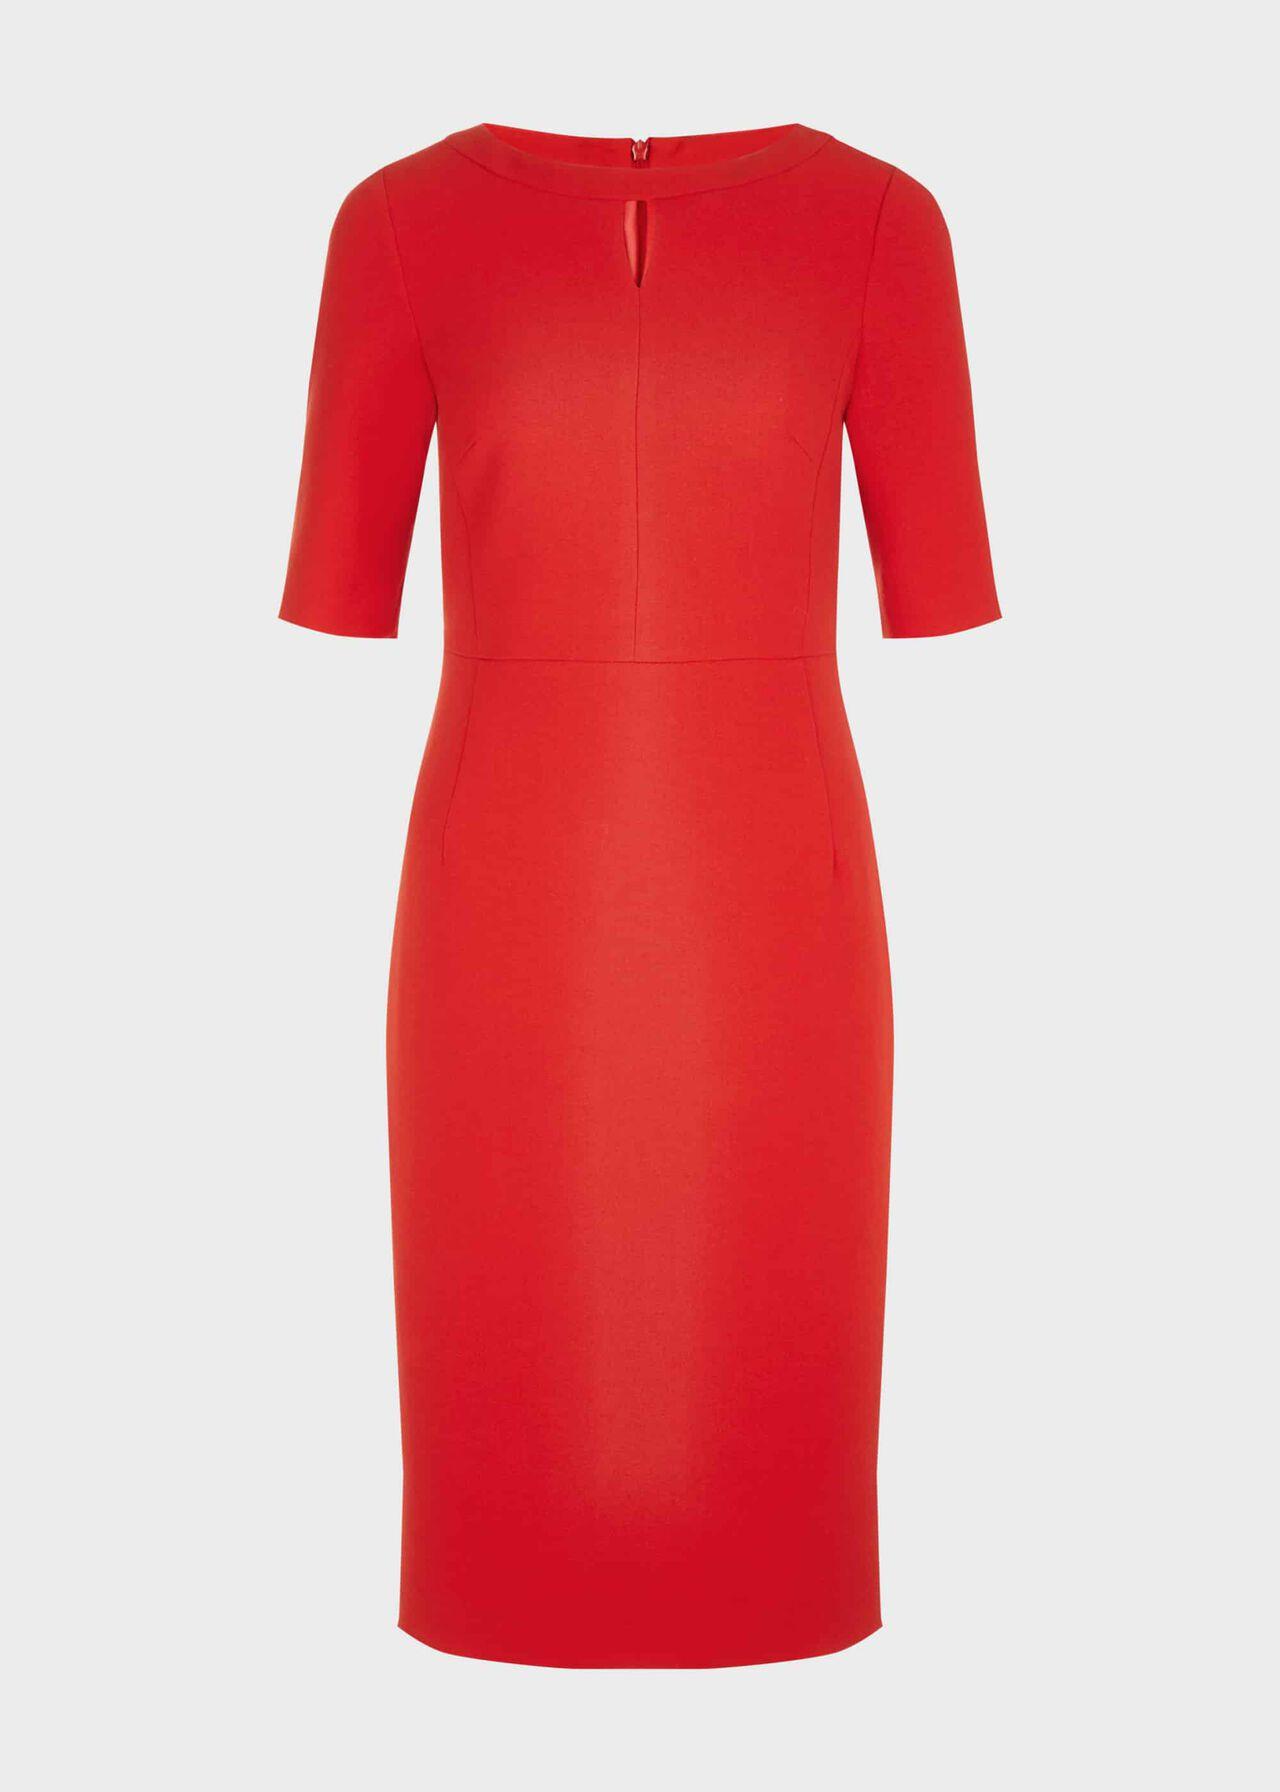 Maura Dress Red